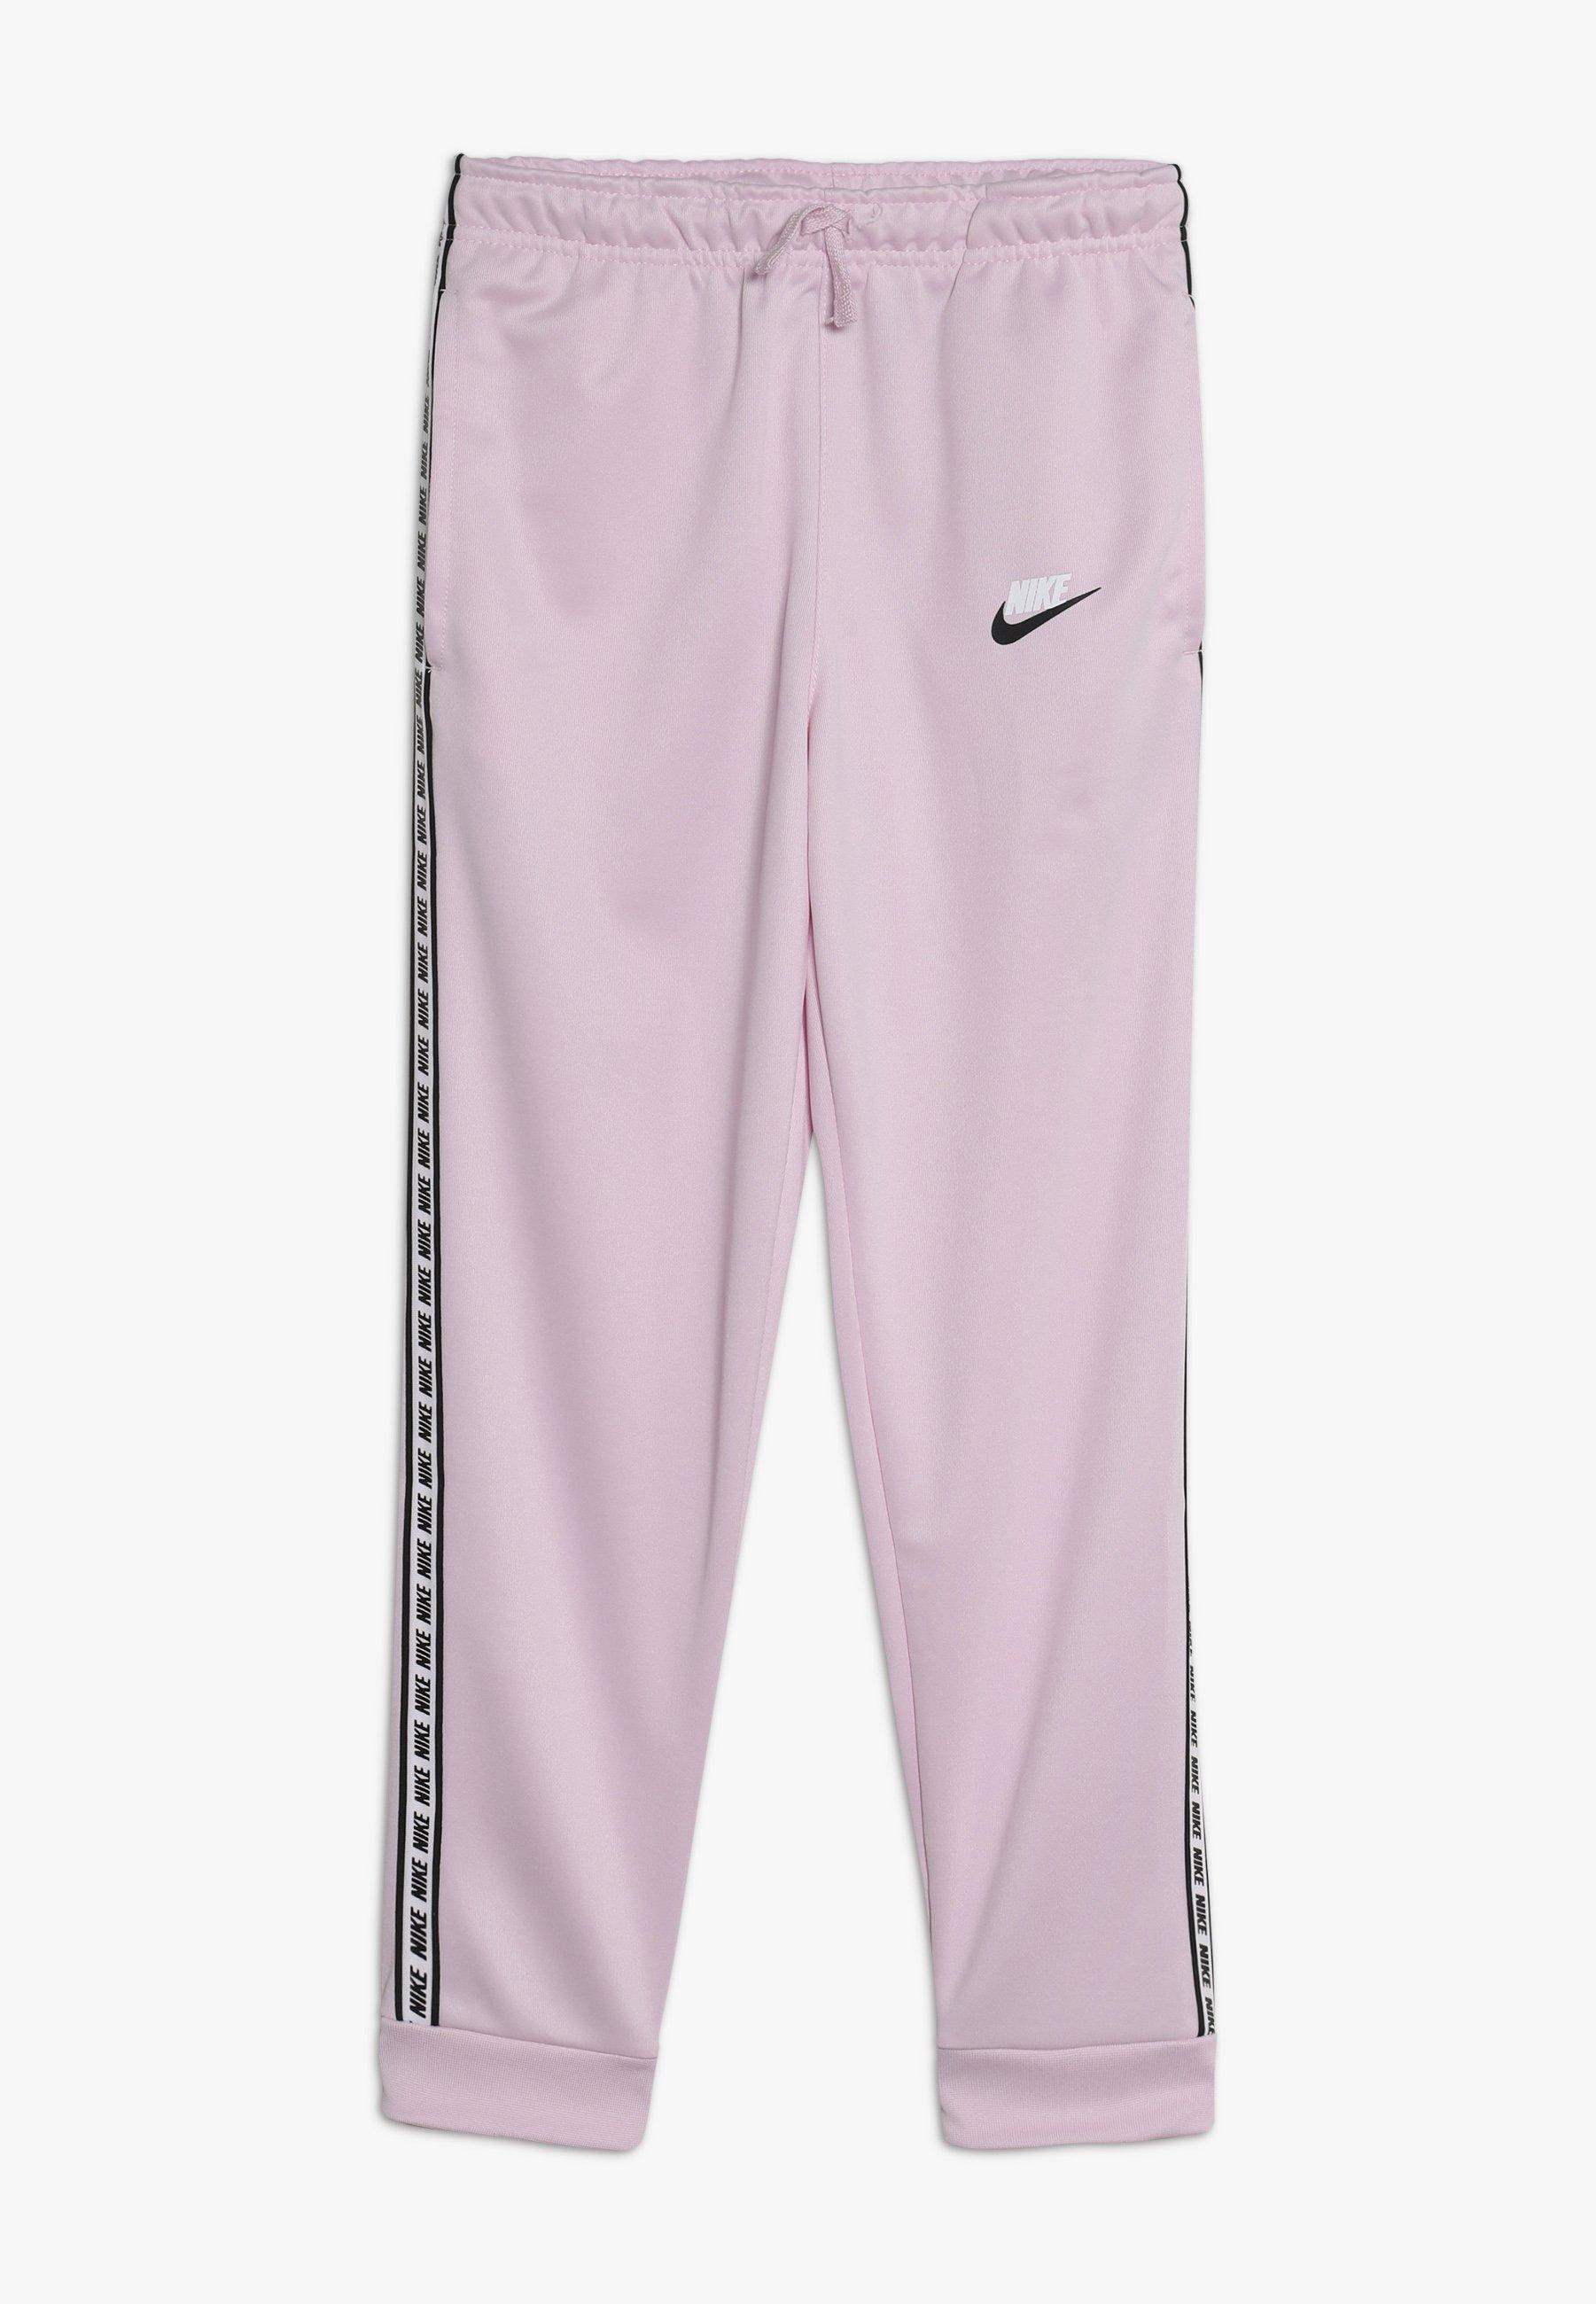 REPEAT PANT POLY Pantalon de survêtement pink foamwhite